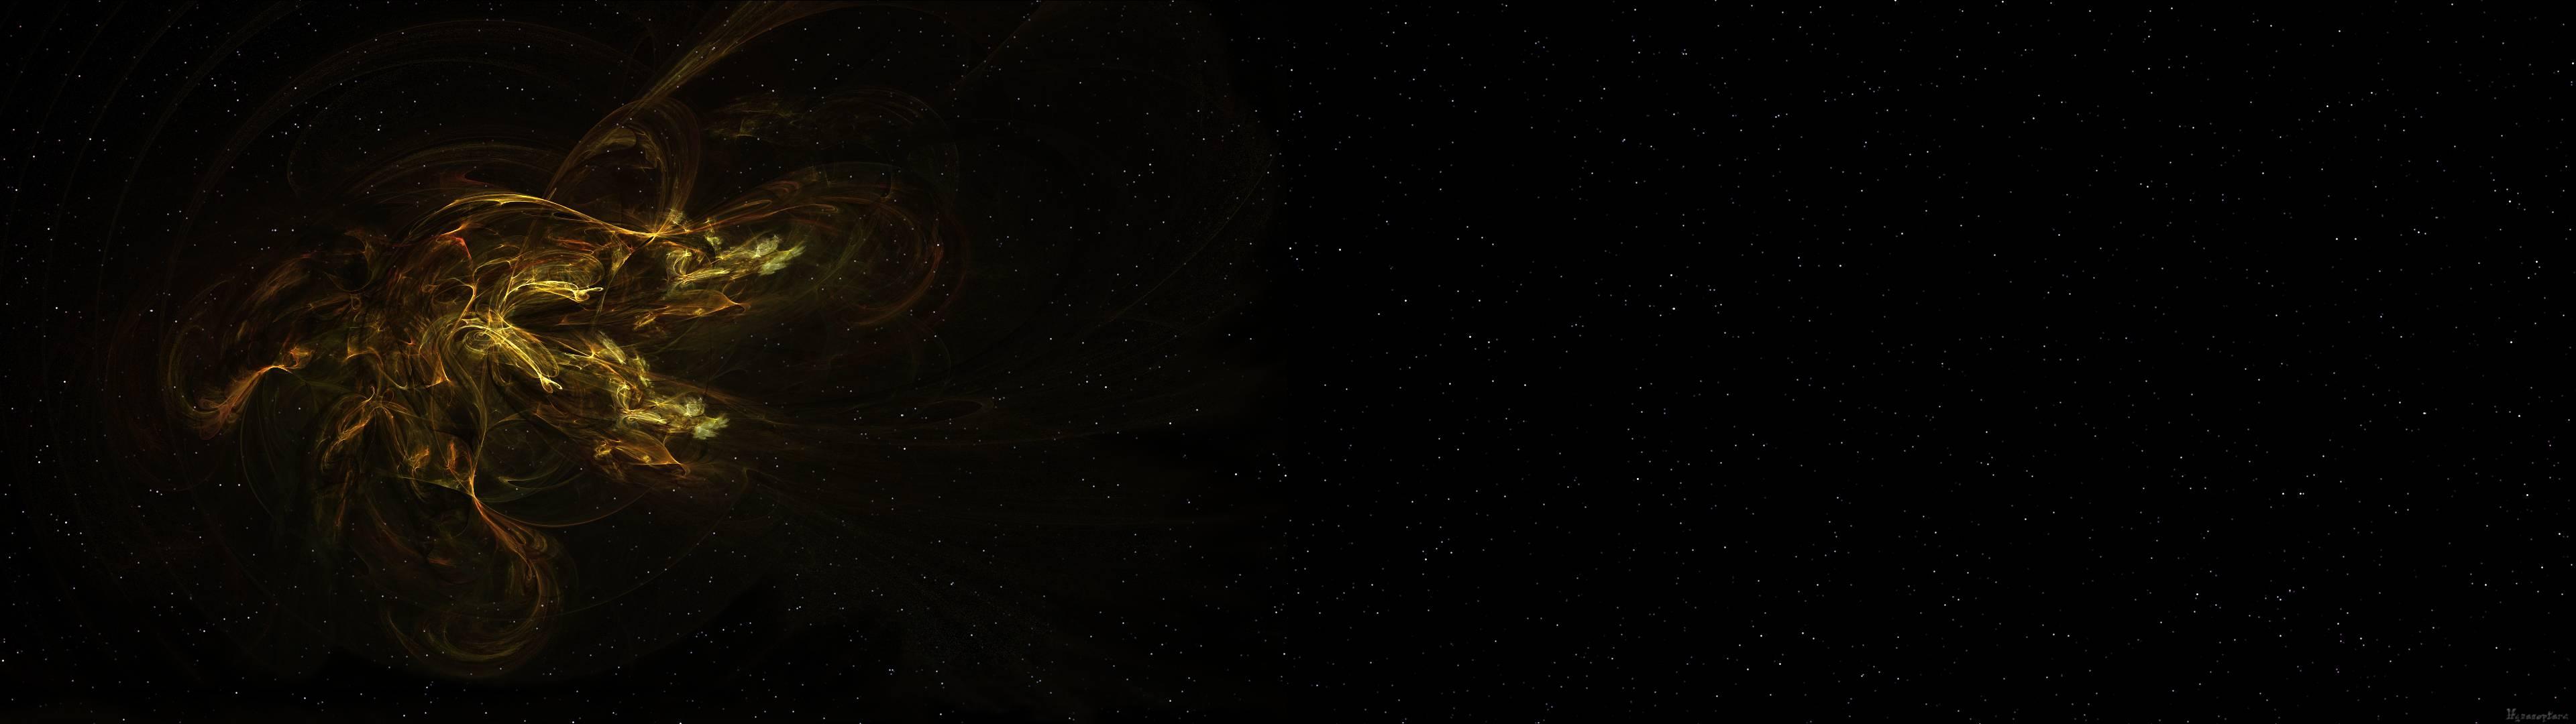 Space Wallpapers  Free HD Desktop Backgrounds